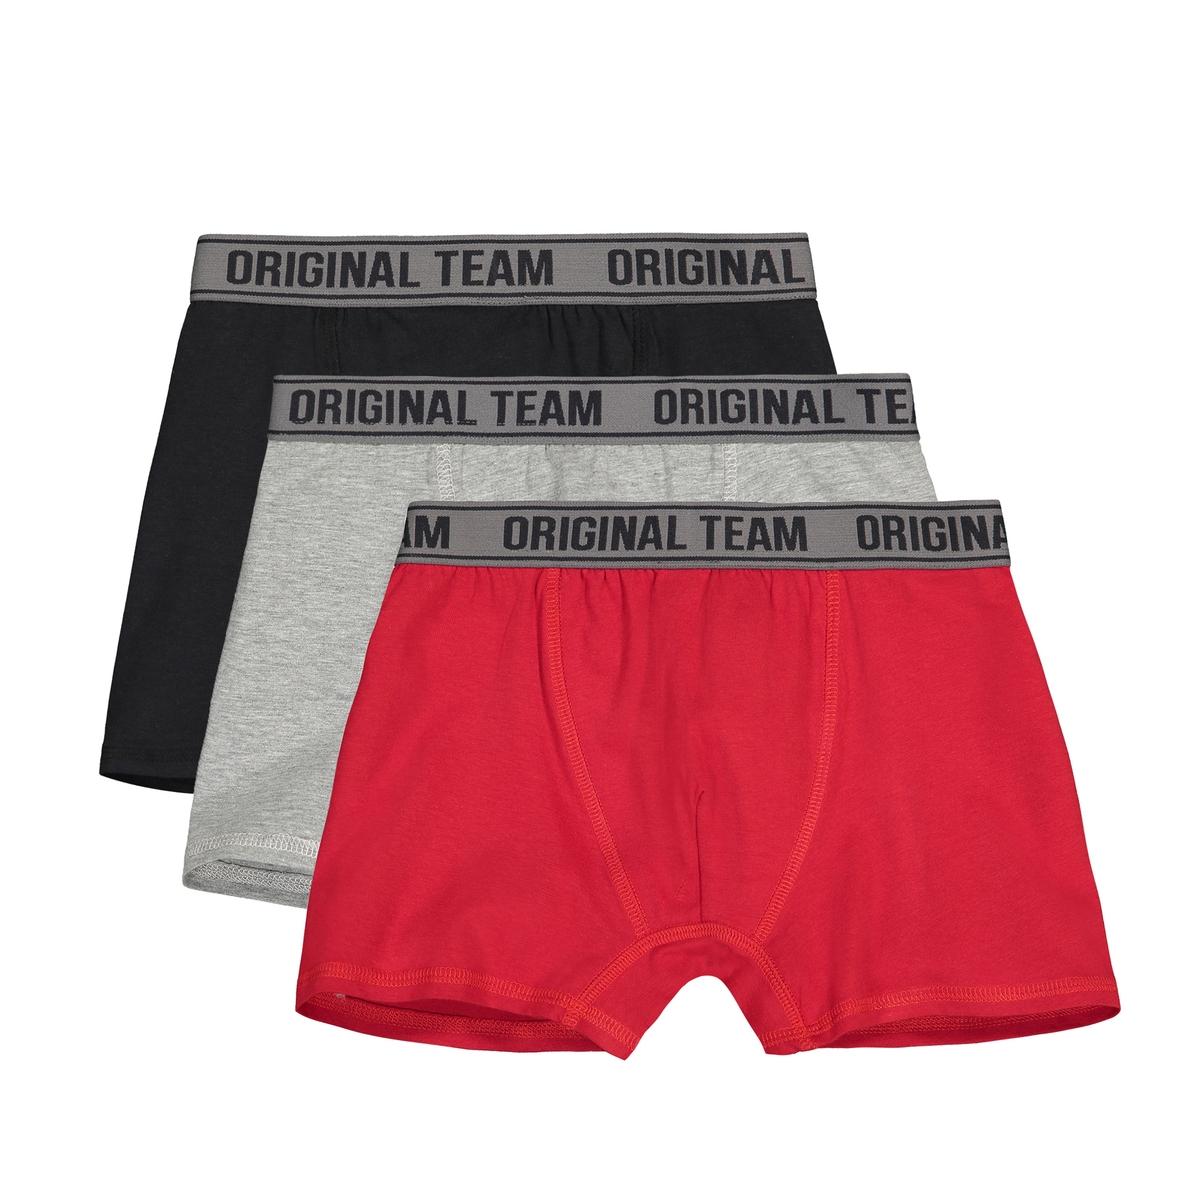 Lote de 3 boxers, 10-18 anos